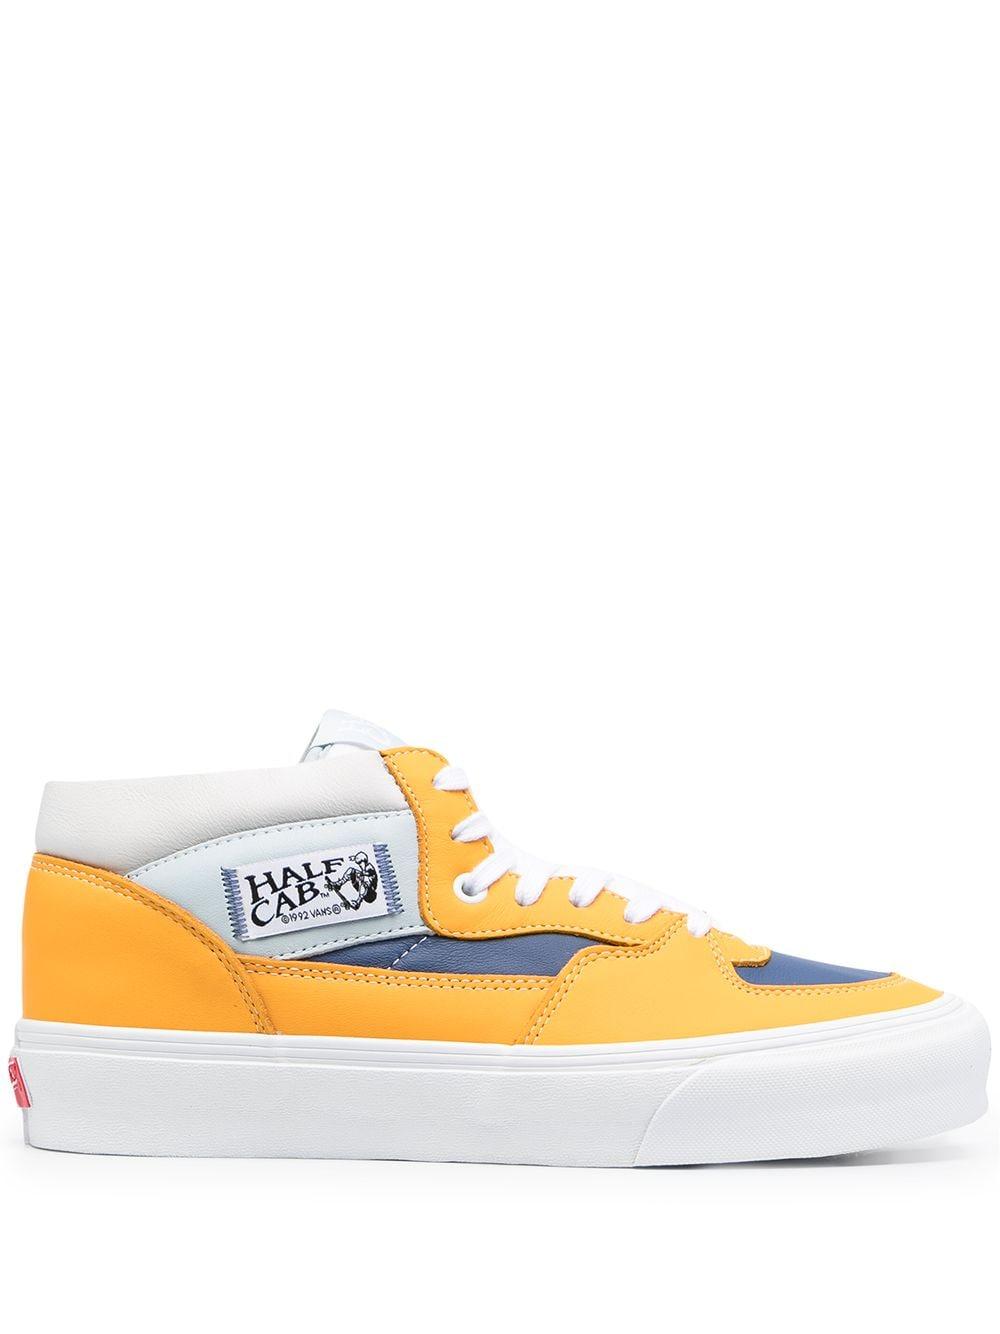 Sneakers Half Cab Uomo VANS VAULT | Sneakers | VN0A5HUS4GJ1